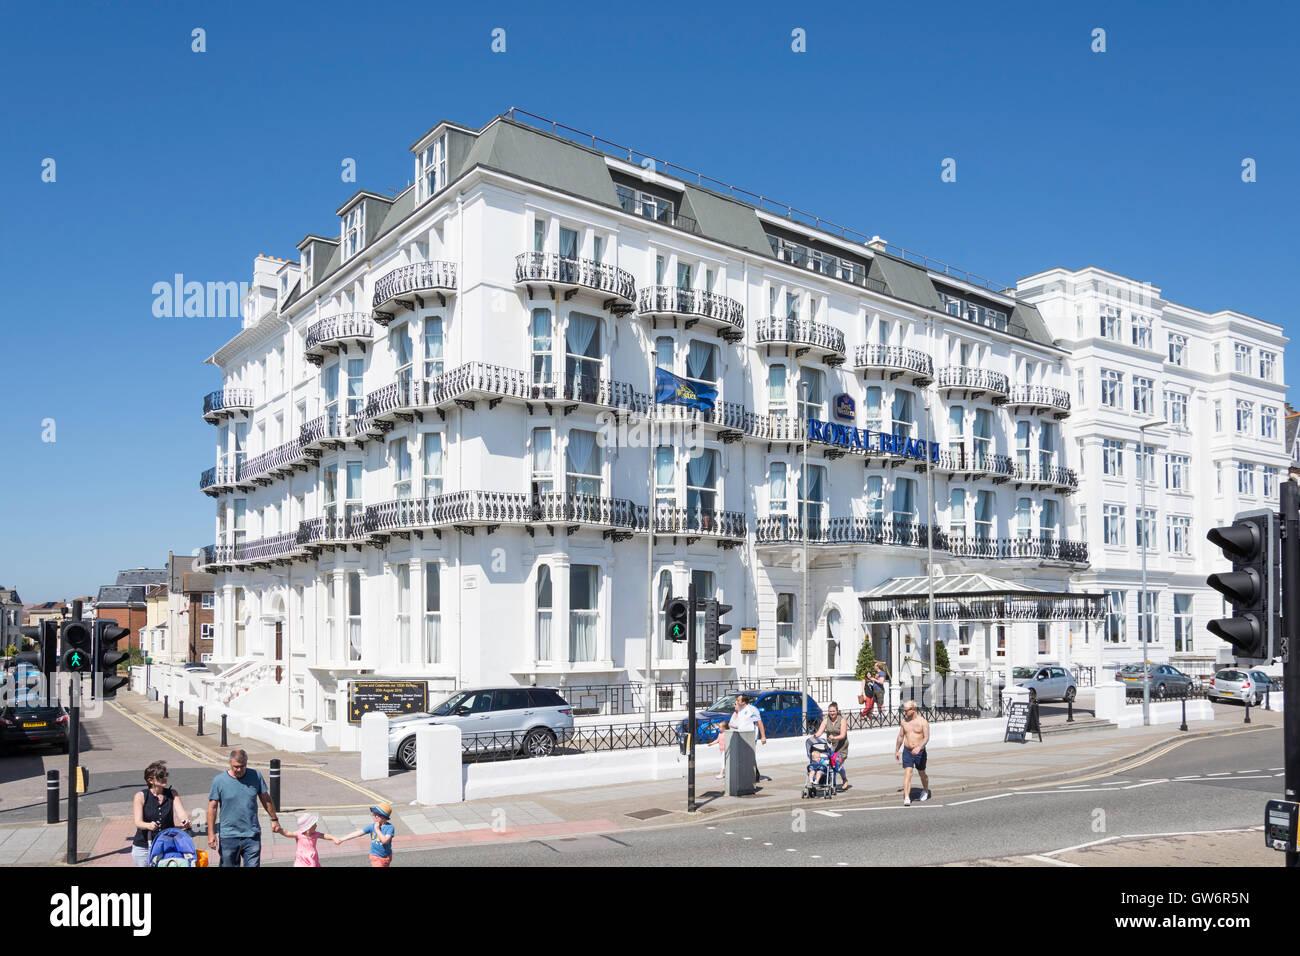 Best Western Royal Beach Hotel South Parade Southsea Portsmouth Hampshire England United Kingdom